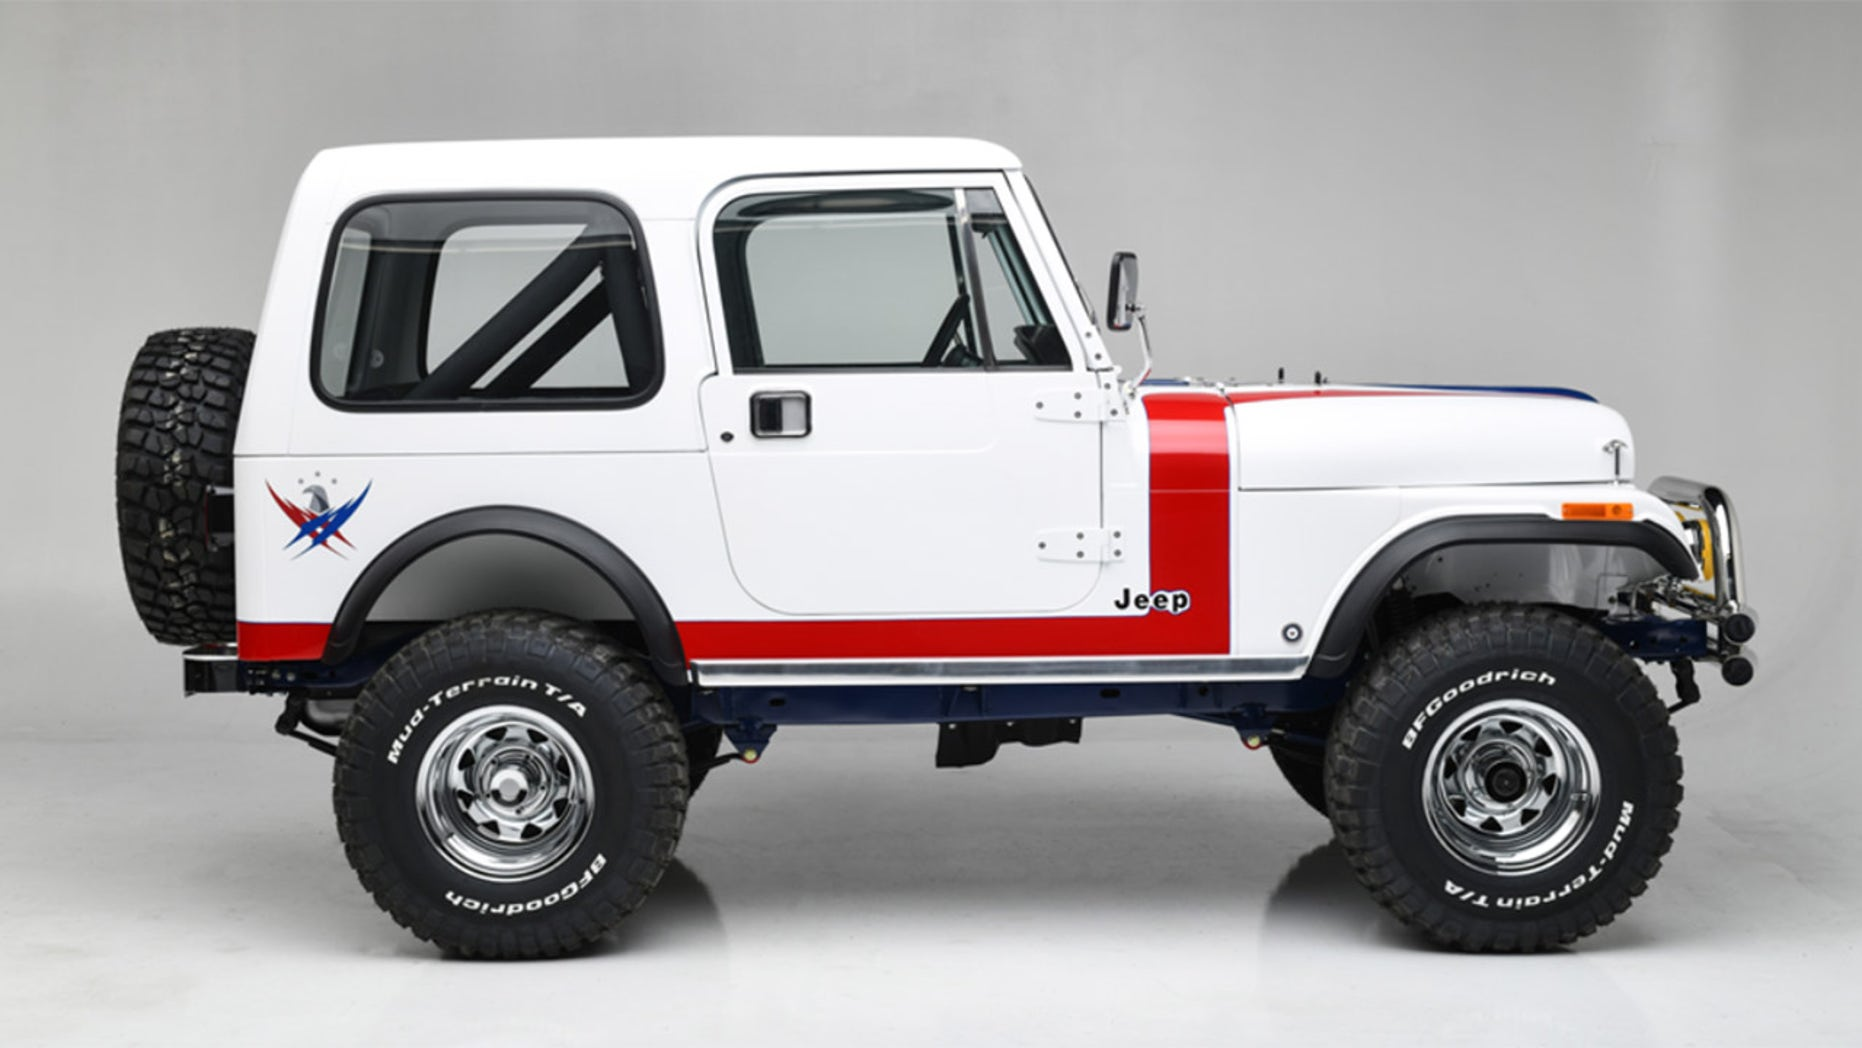 1981 Jeep CJ7 side view